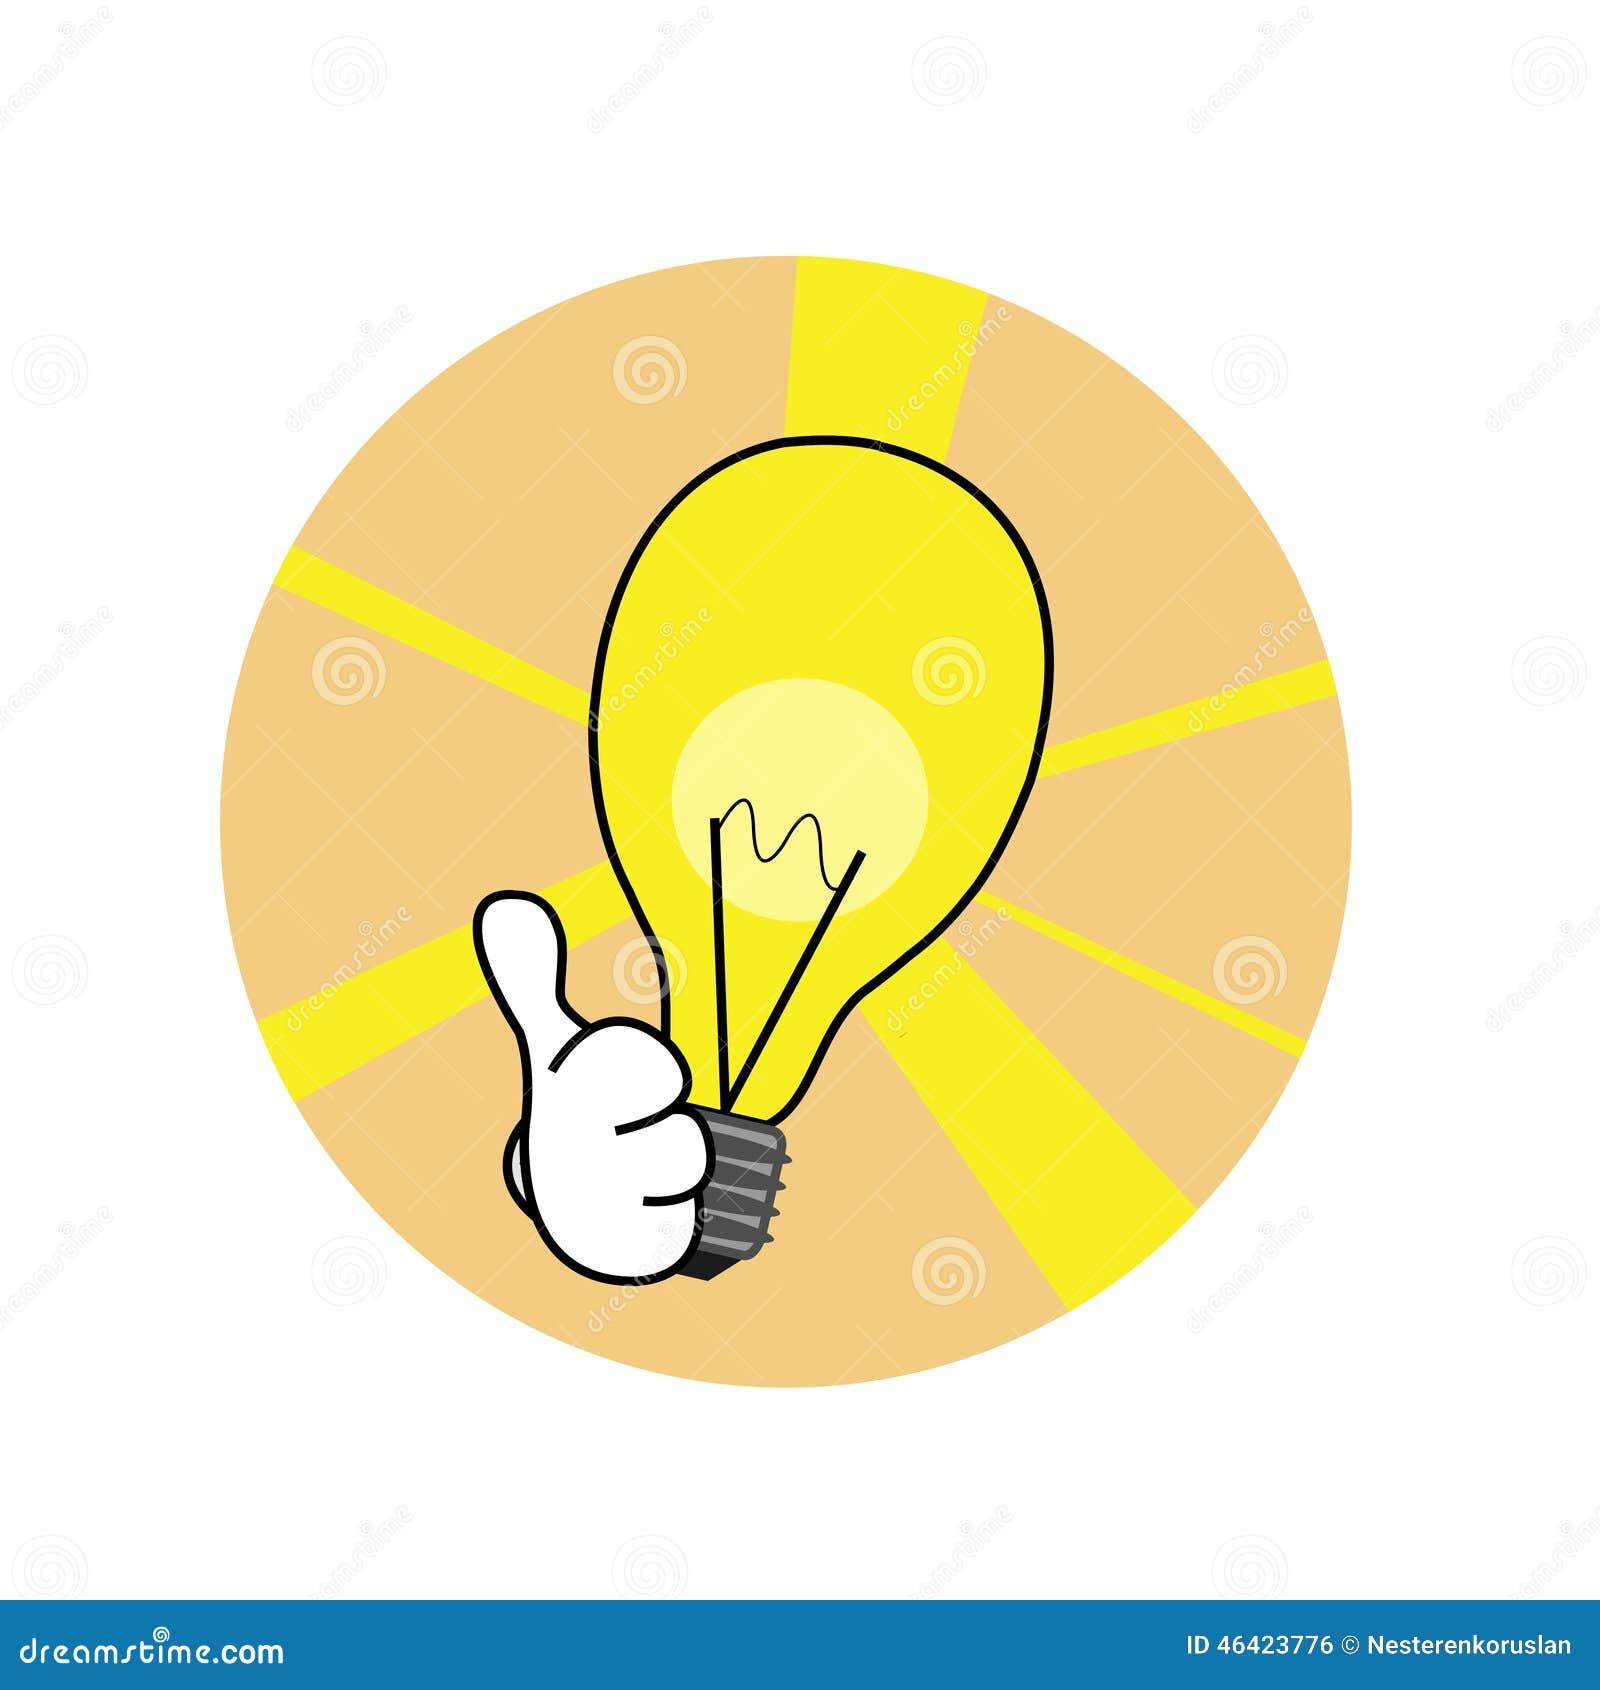 анимация лампа